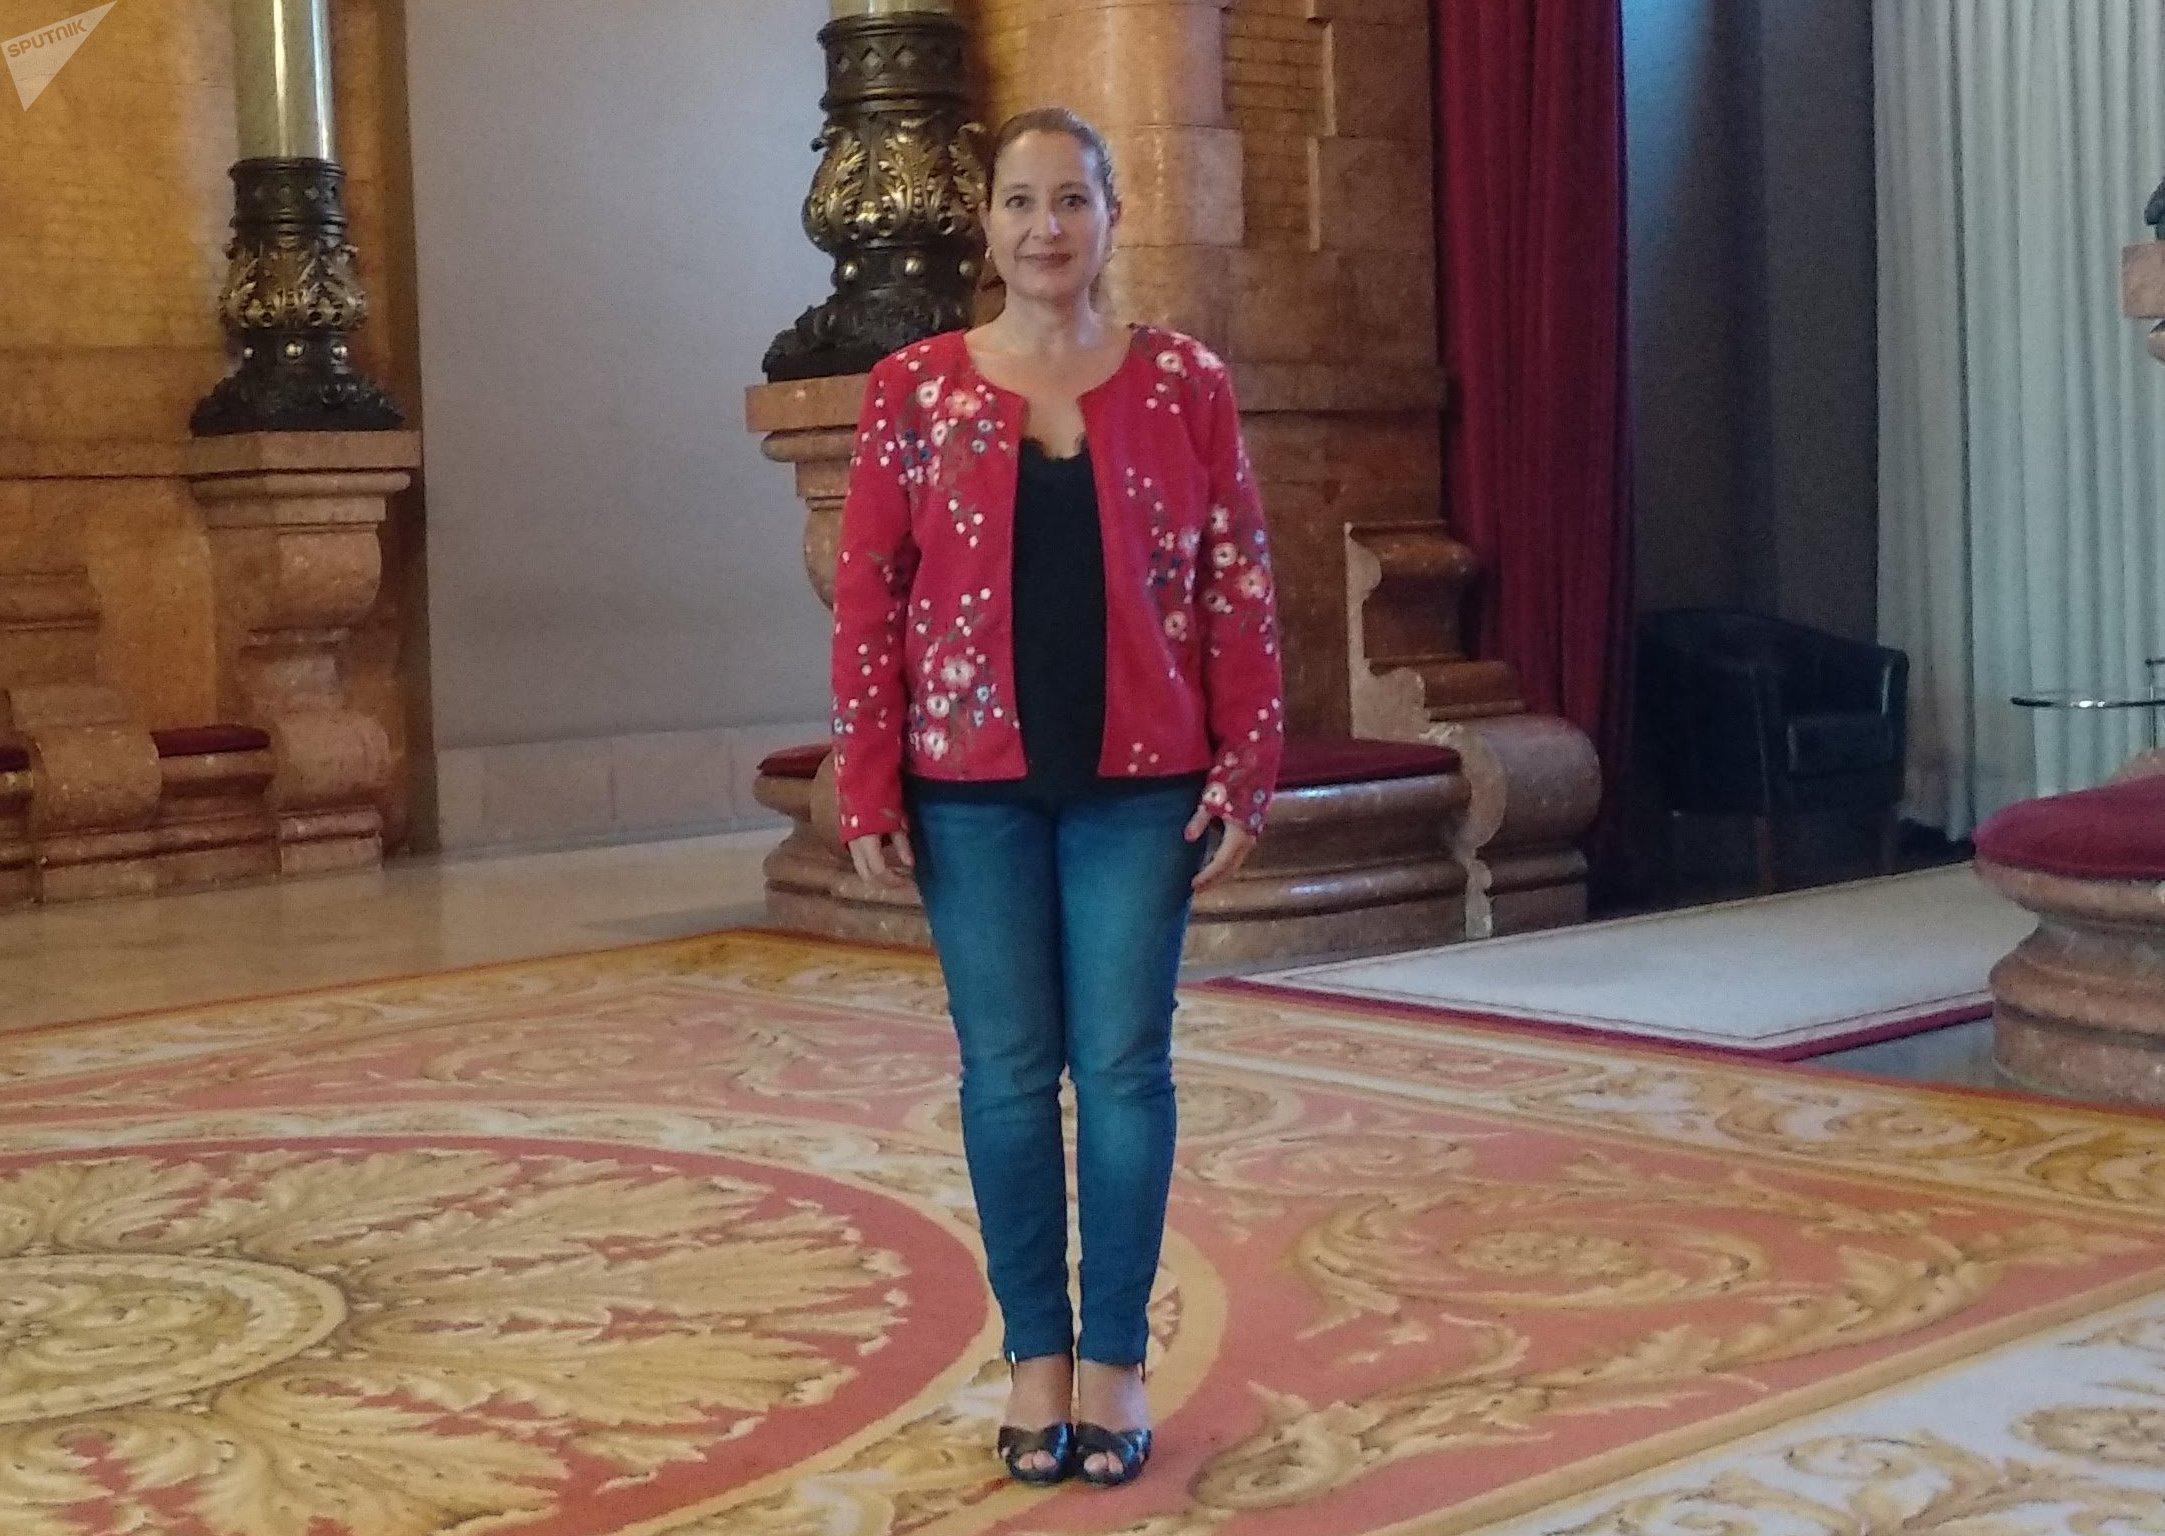 La diputada de Ciudadanos Sonia Sierra